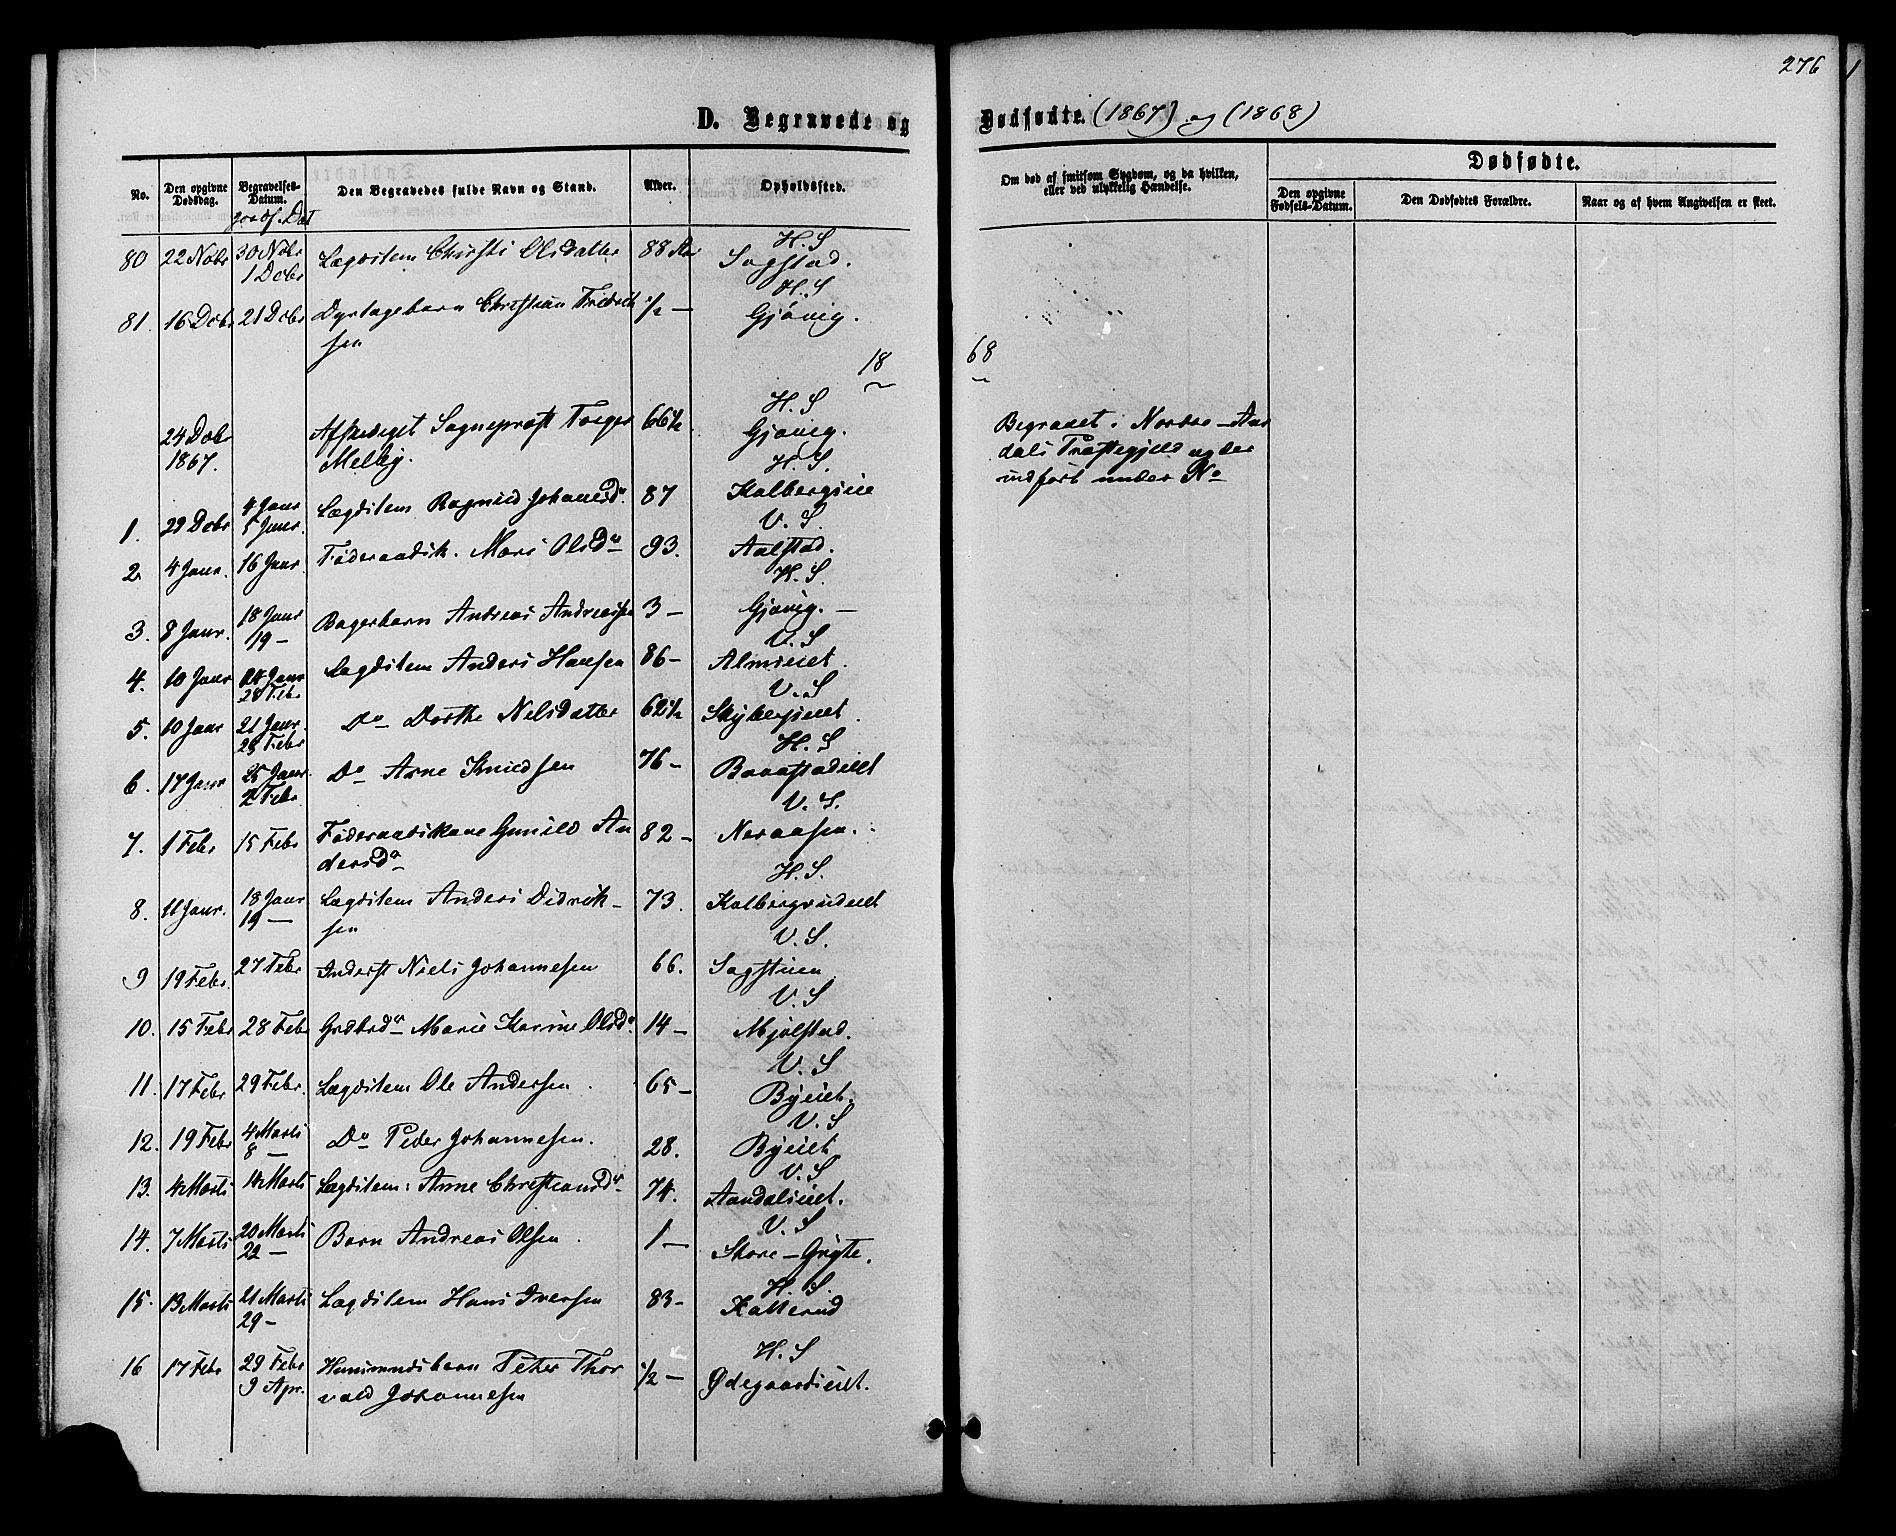 SAH, Vardal prestekontor, H/Ha/Haa/L0007: Ministerialbok nr. 7, 1867-1878, s. 276